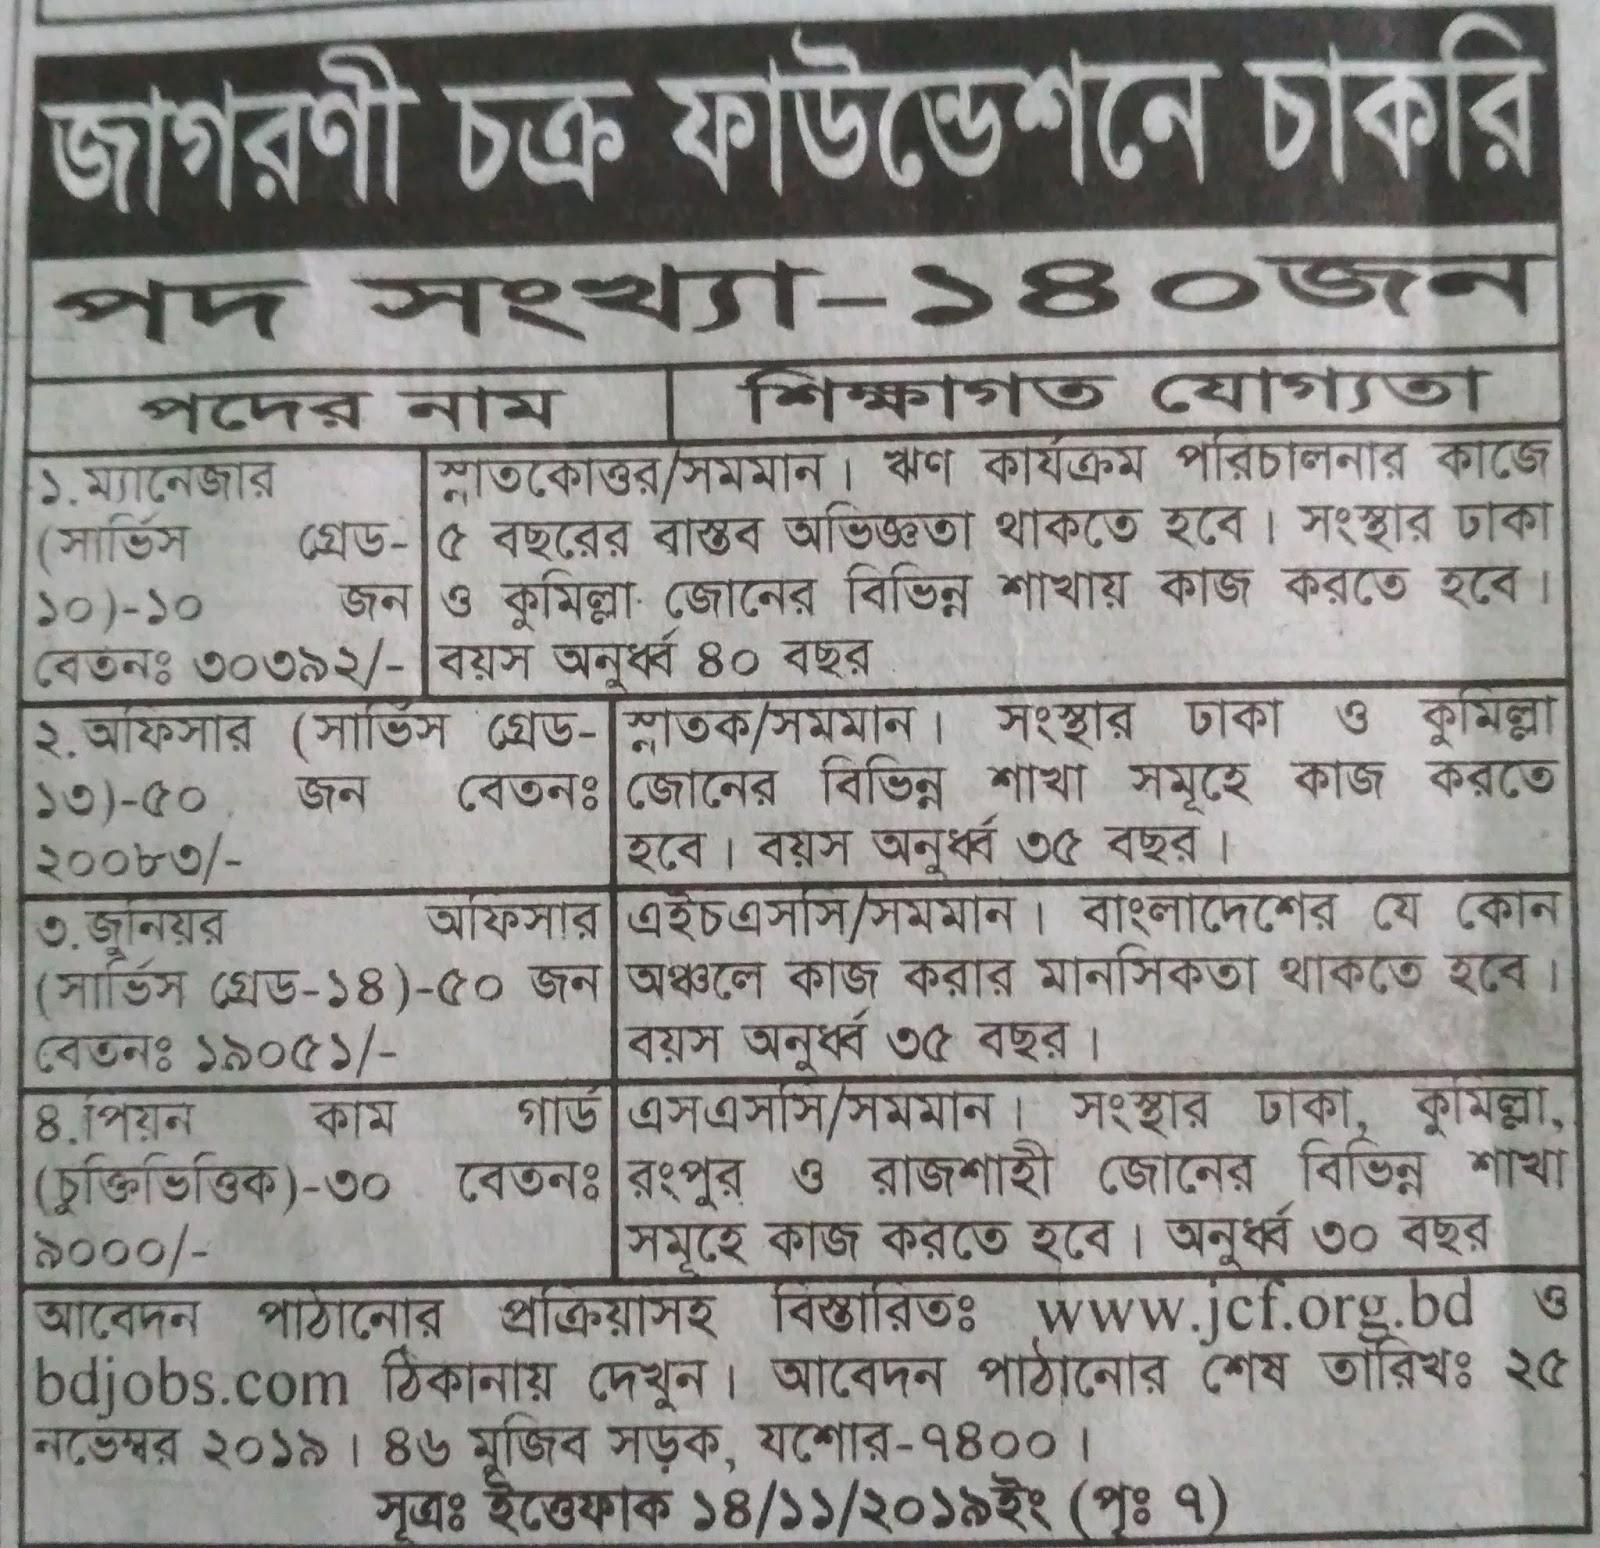 Jagorani Chakra Foundation NGO Job Circular